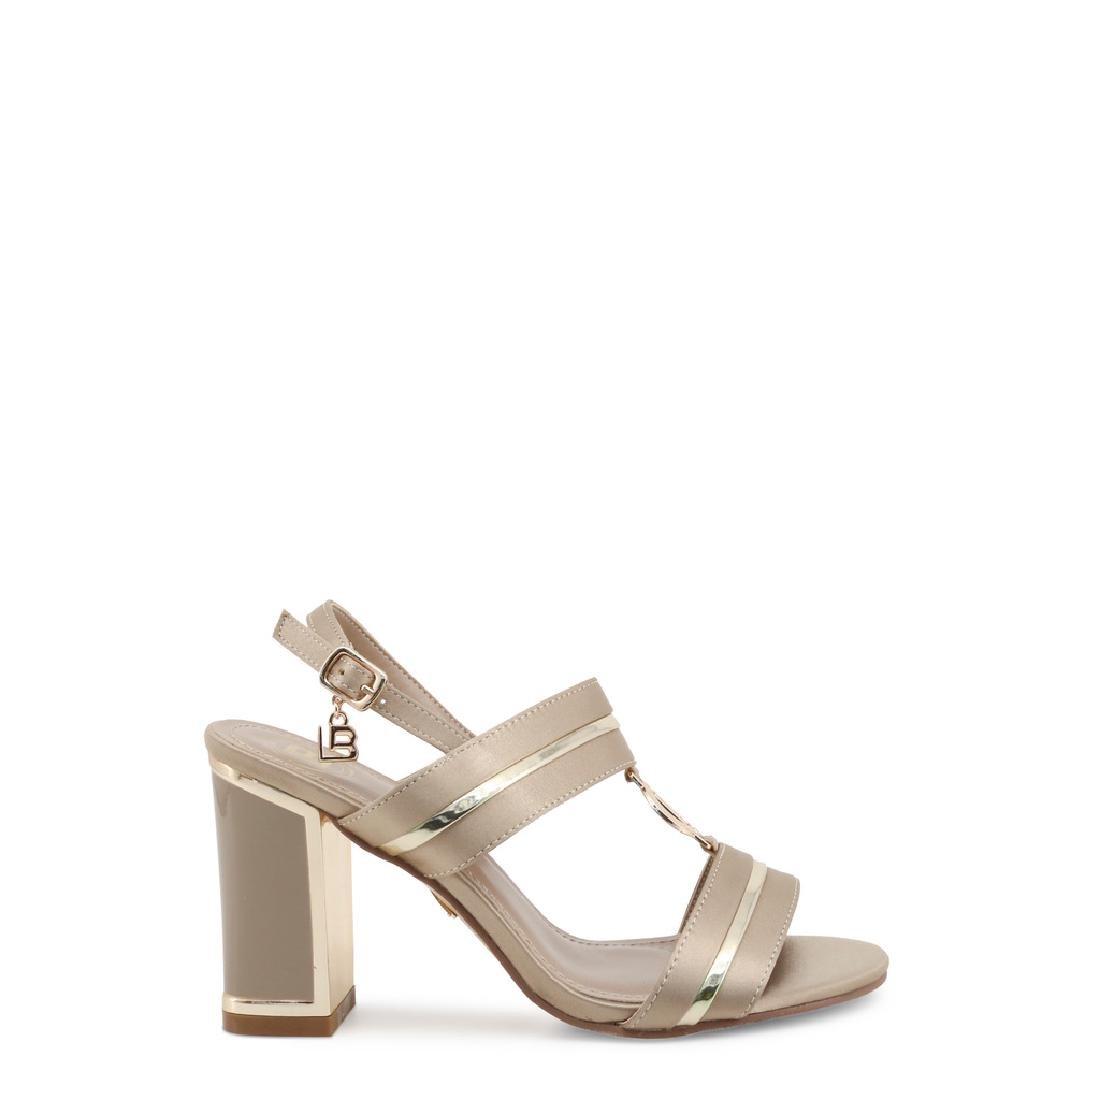 Laura Biagiotti Italian Designer High Heel Sandals EUR - 2